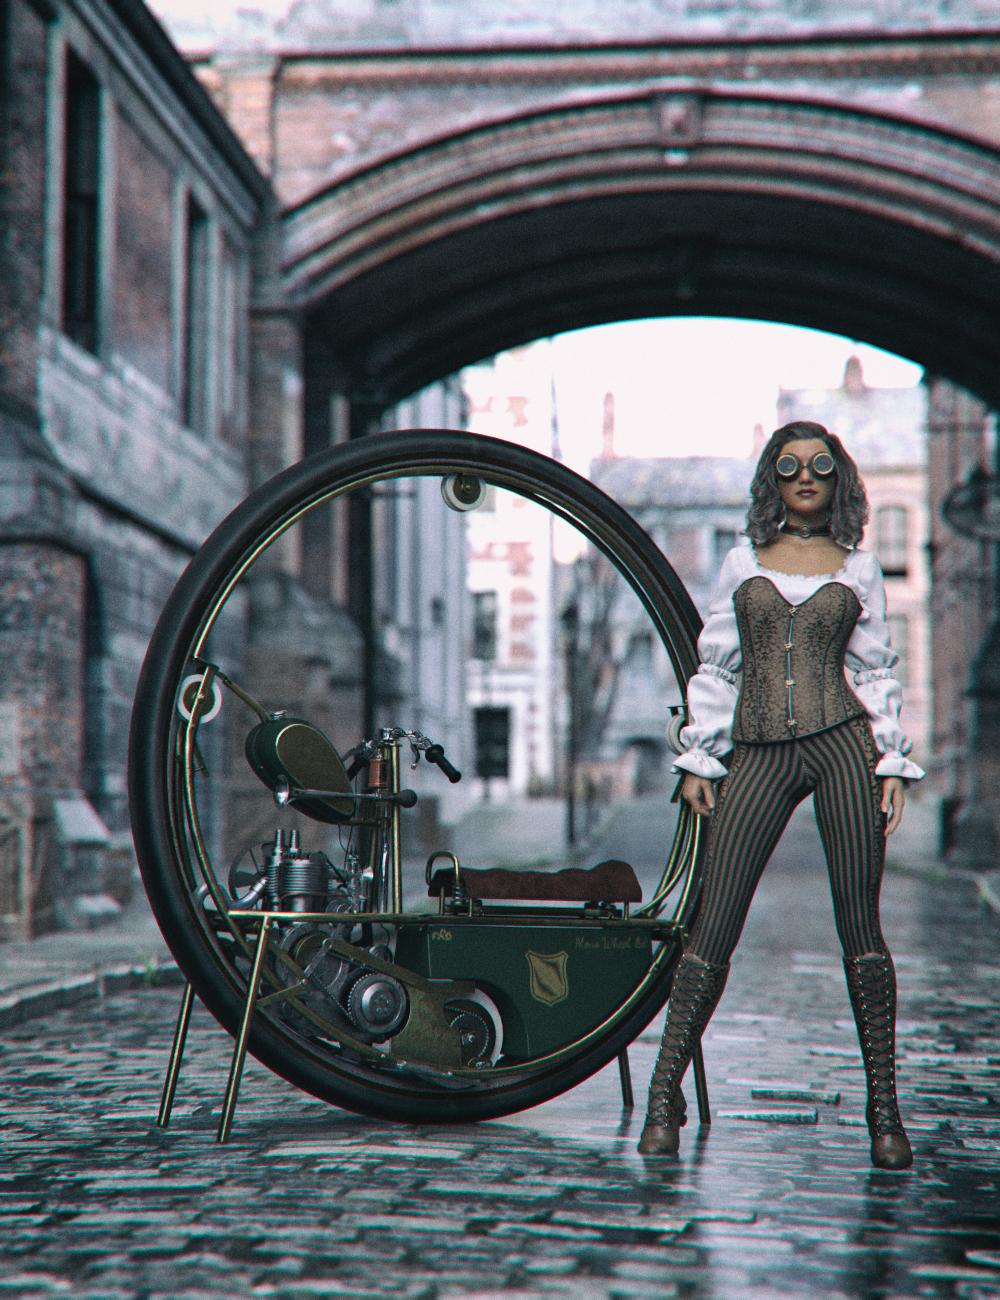 Steampunk MonoWheel by: Mely3D, 3D Models by Daz 3D